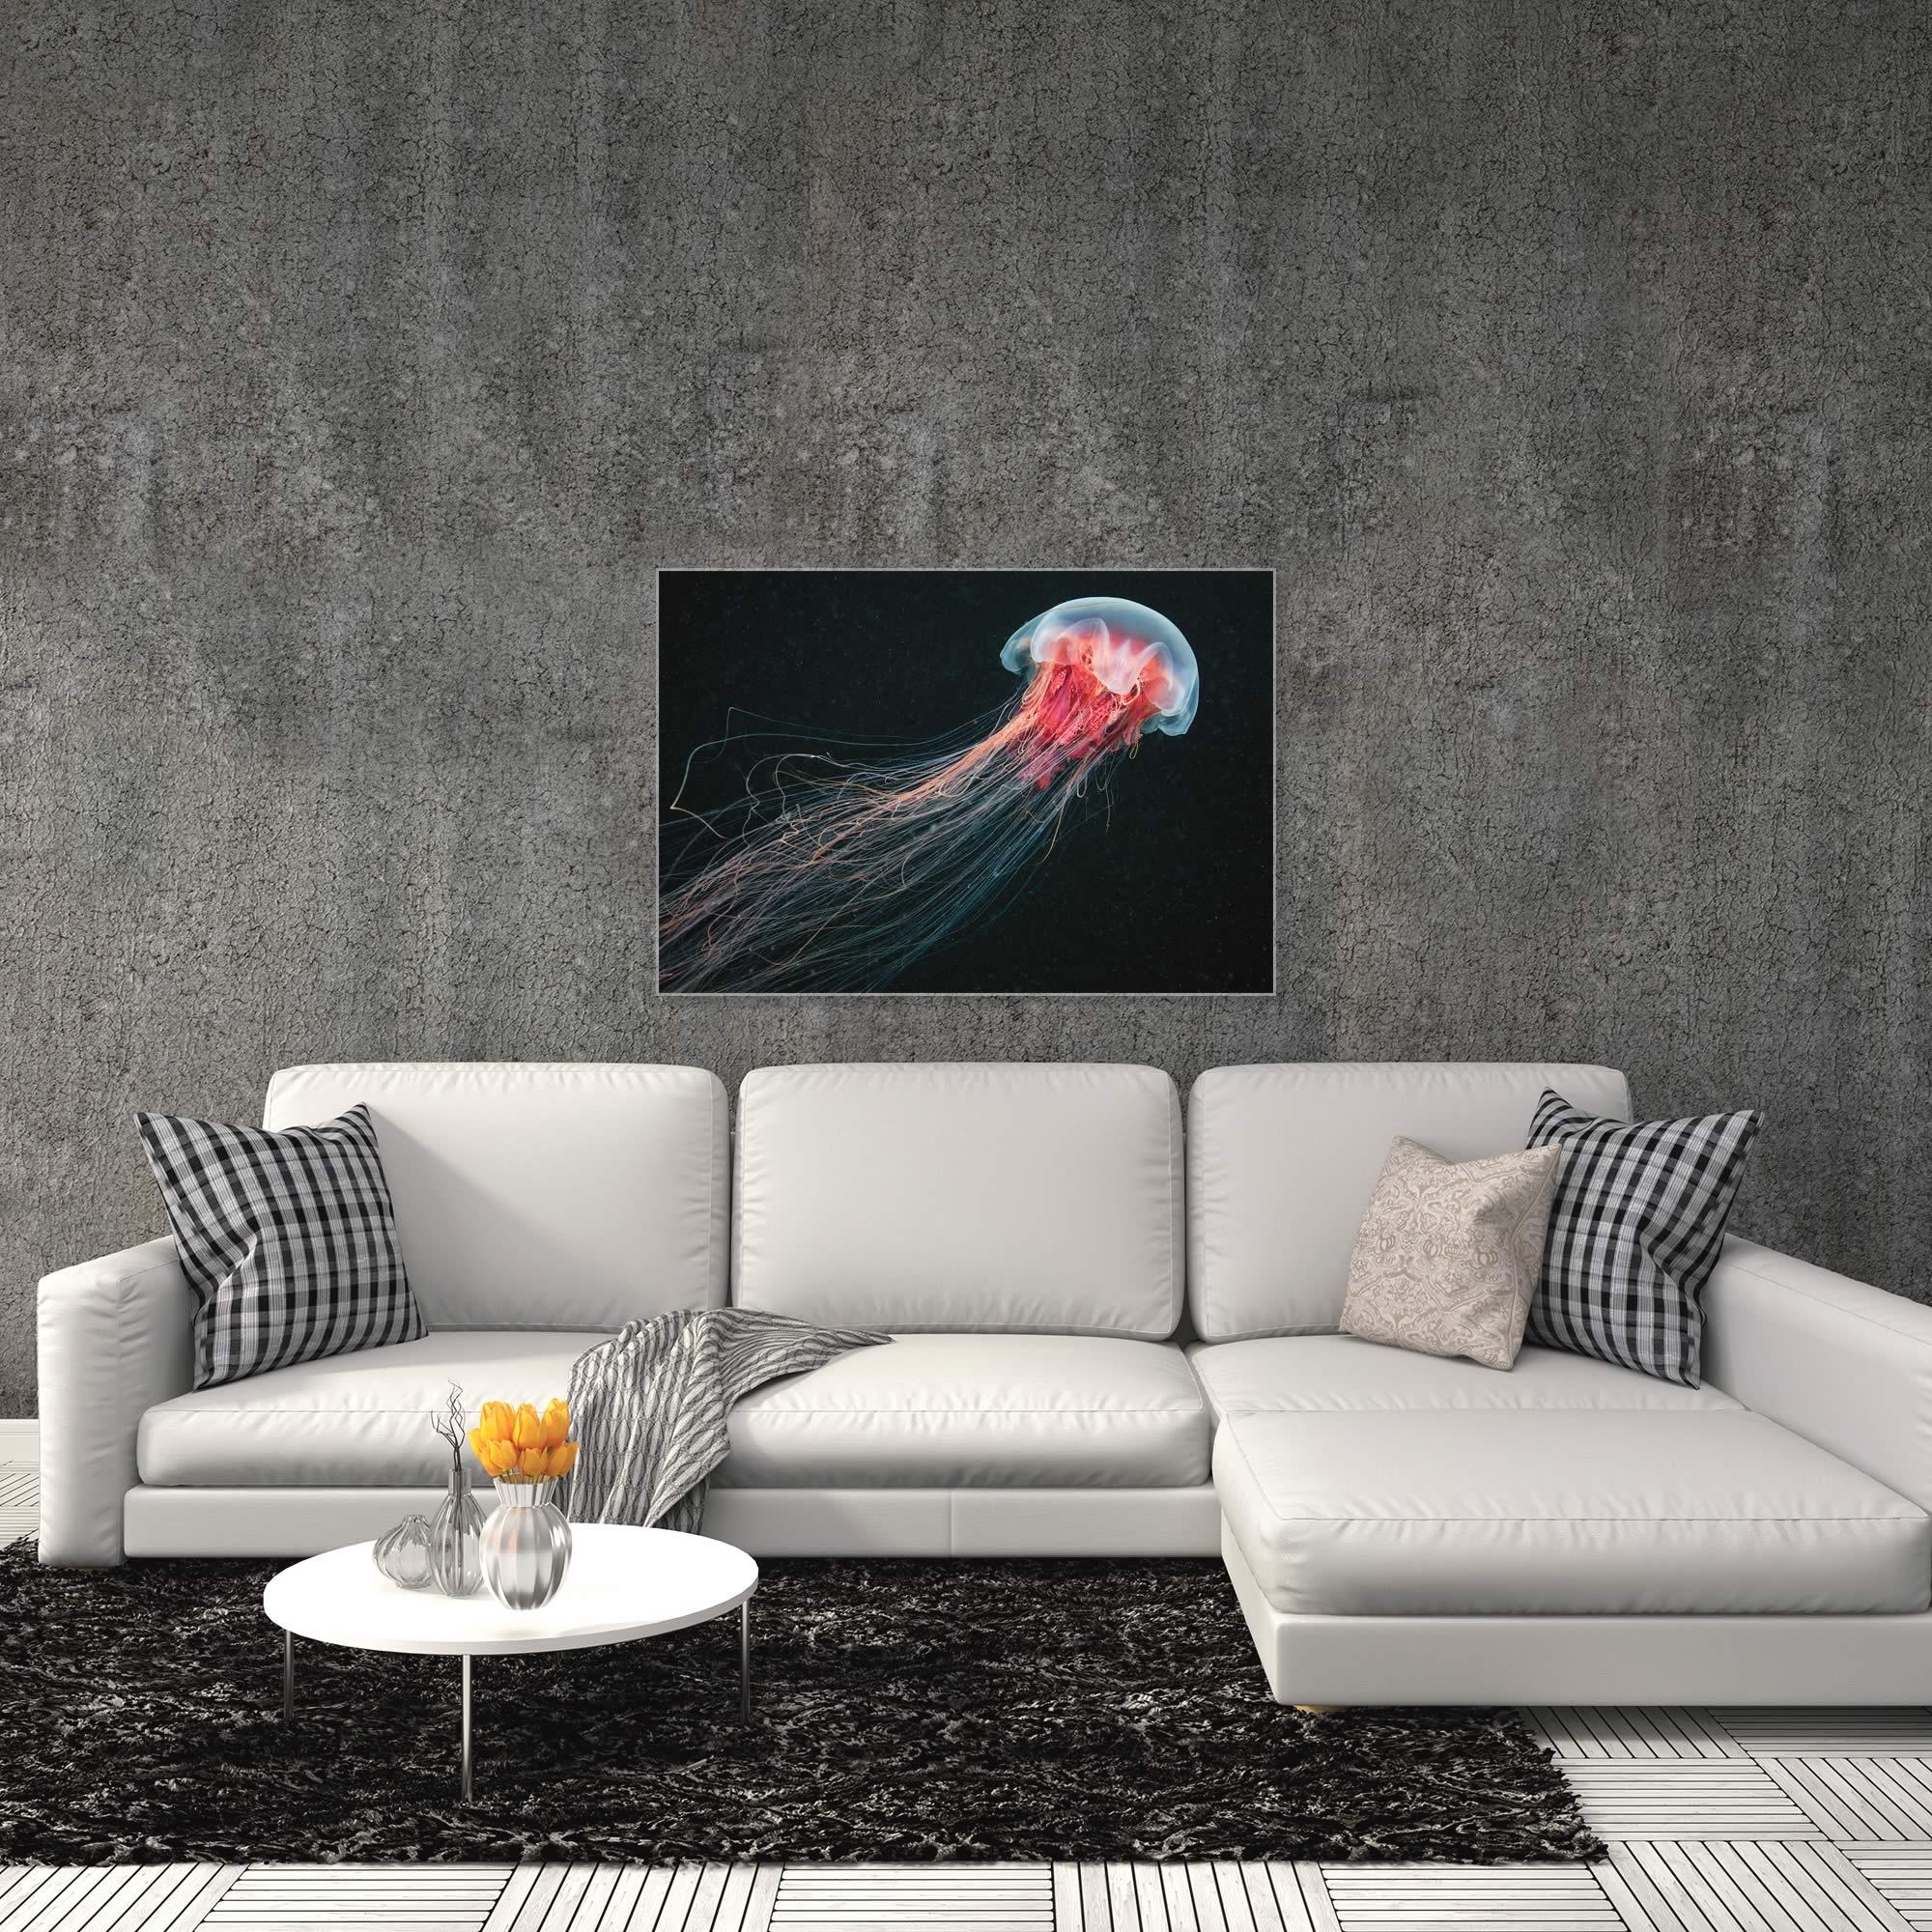 Longtail Jellyfish by Alexander Semenov - Jellyfish Artwork on Metal or Acrylic - Alternate View 3